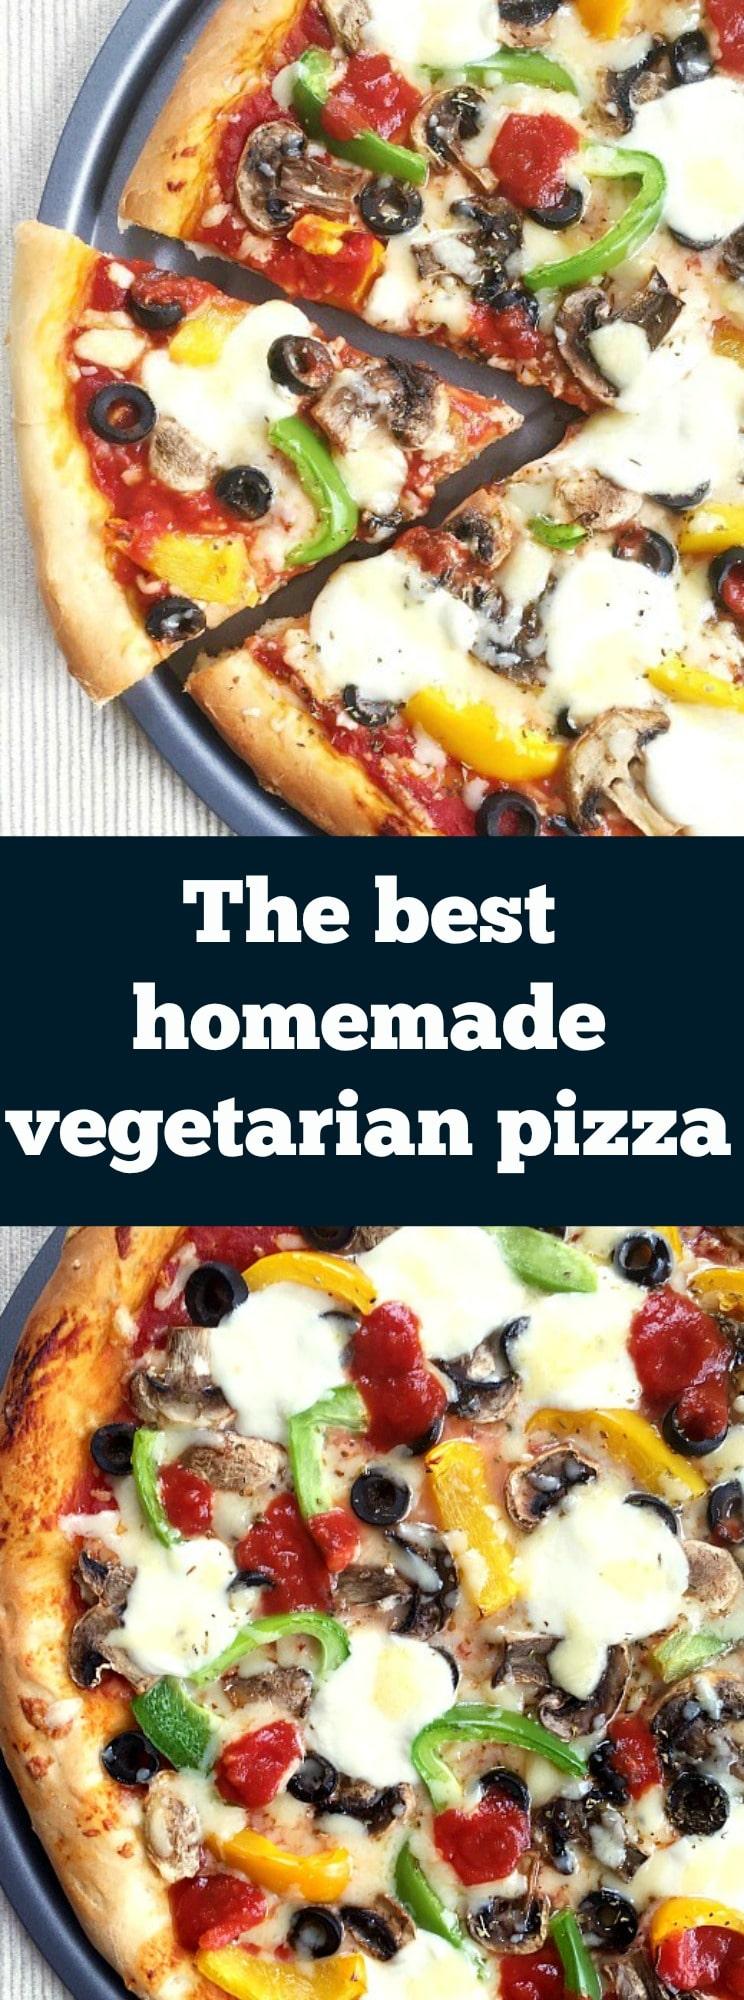 The best homemade vegetarian pizza